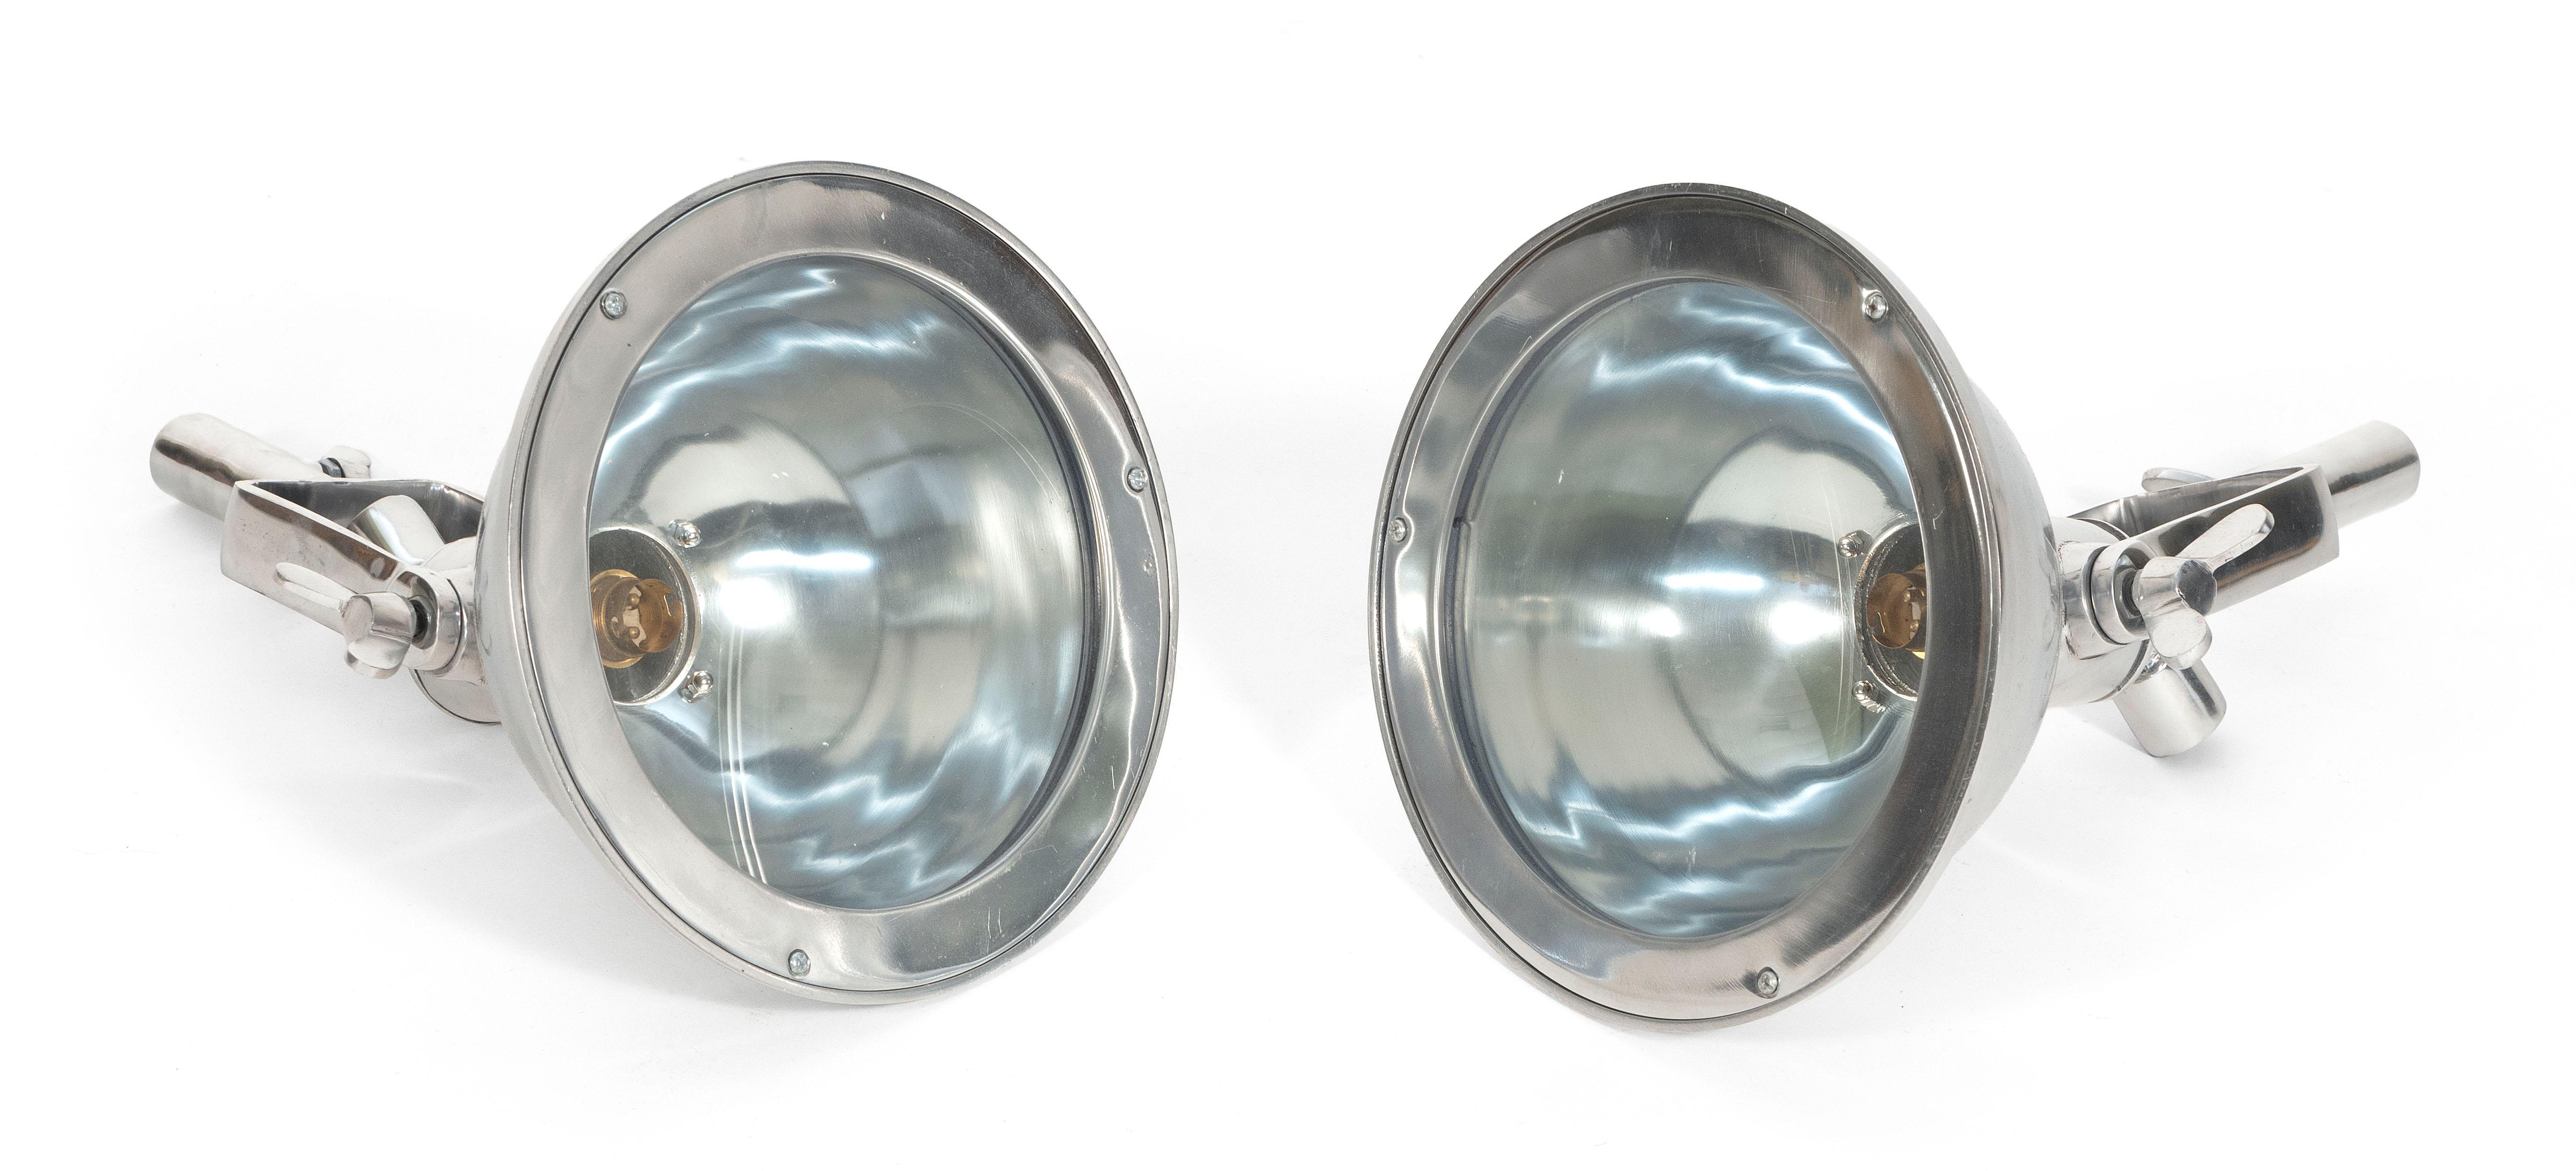 "PAIR OF ALUMINUM CARGO LIGHTS 20th Century Heights 14.25"". Lens diameters 7.75""."